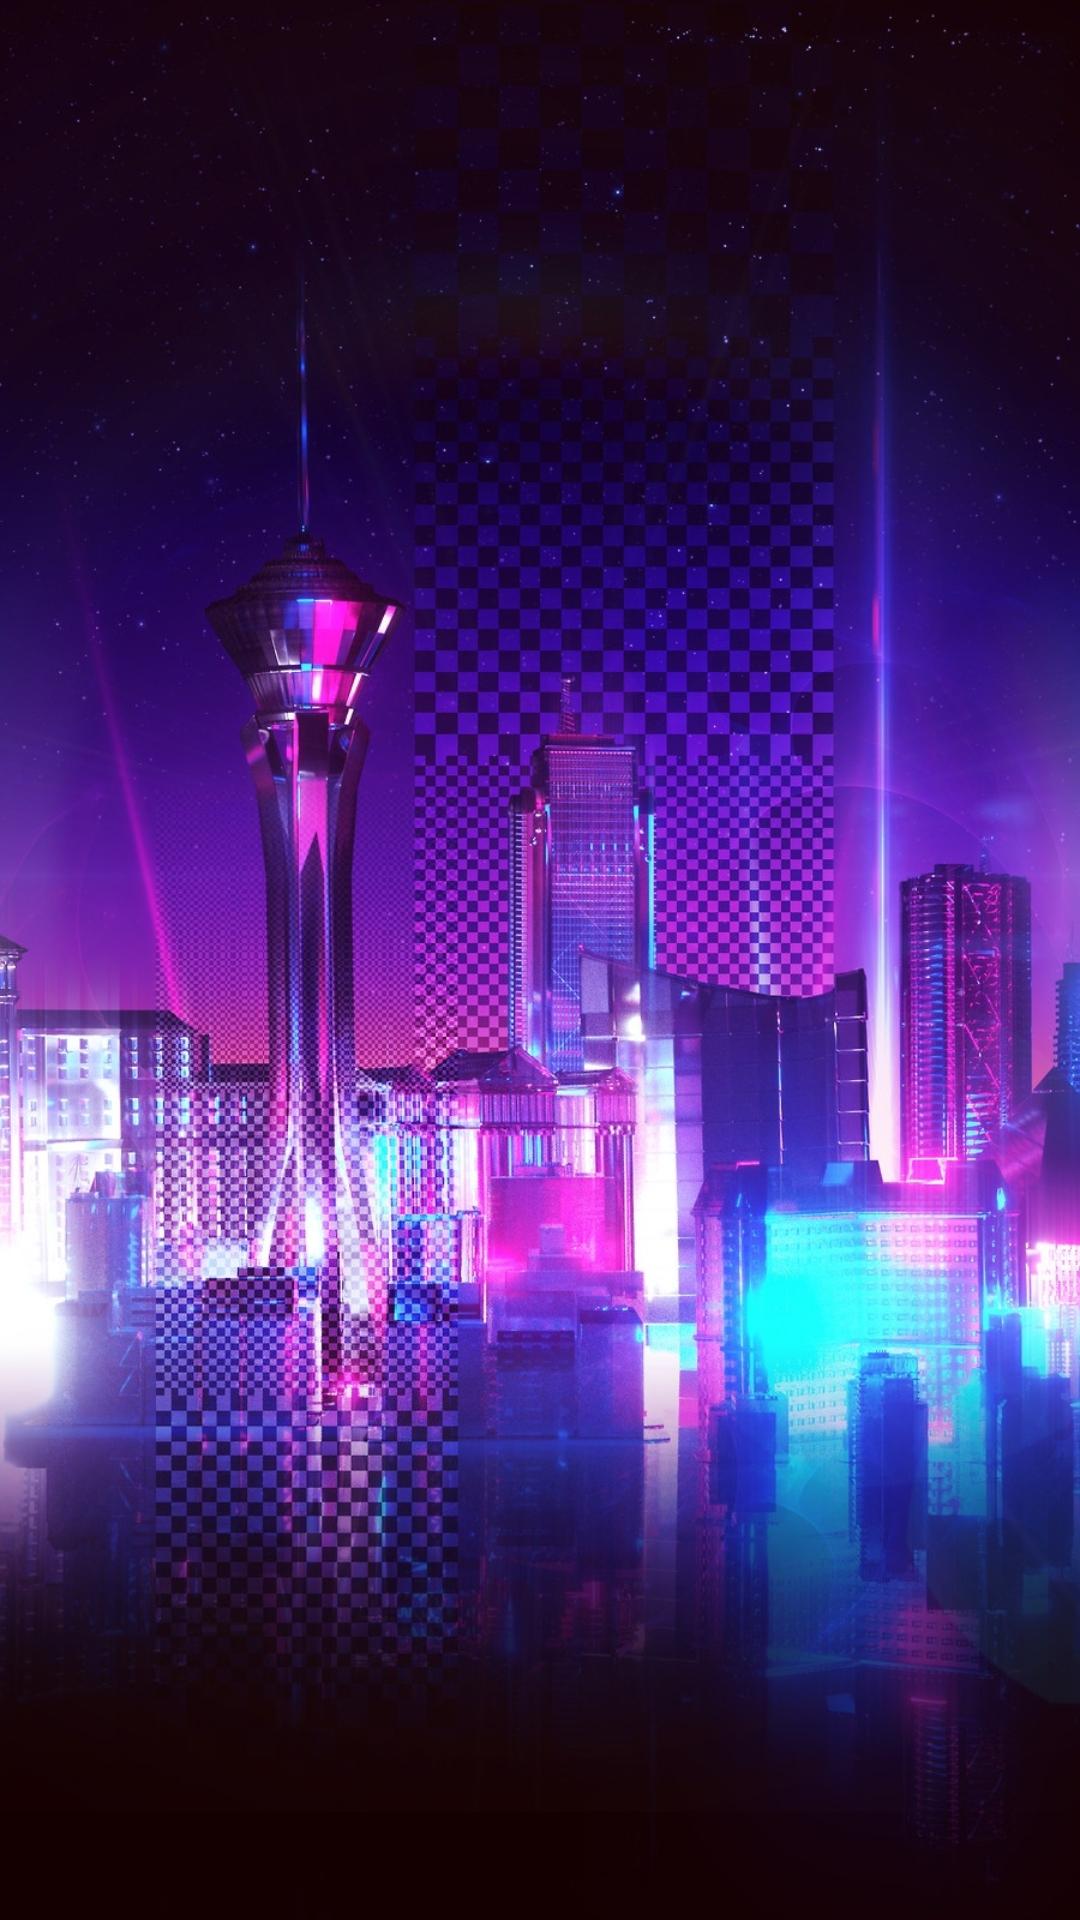 Neon City, Purple Racing Phone Wallpaper – Wallpapers For Tech